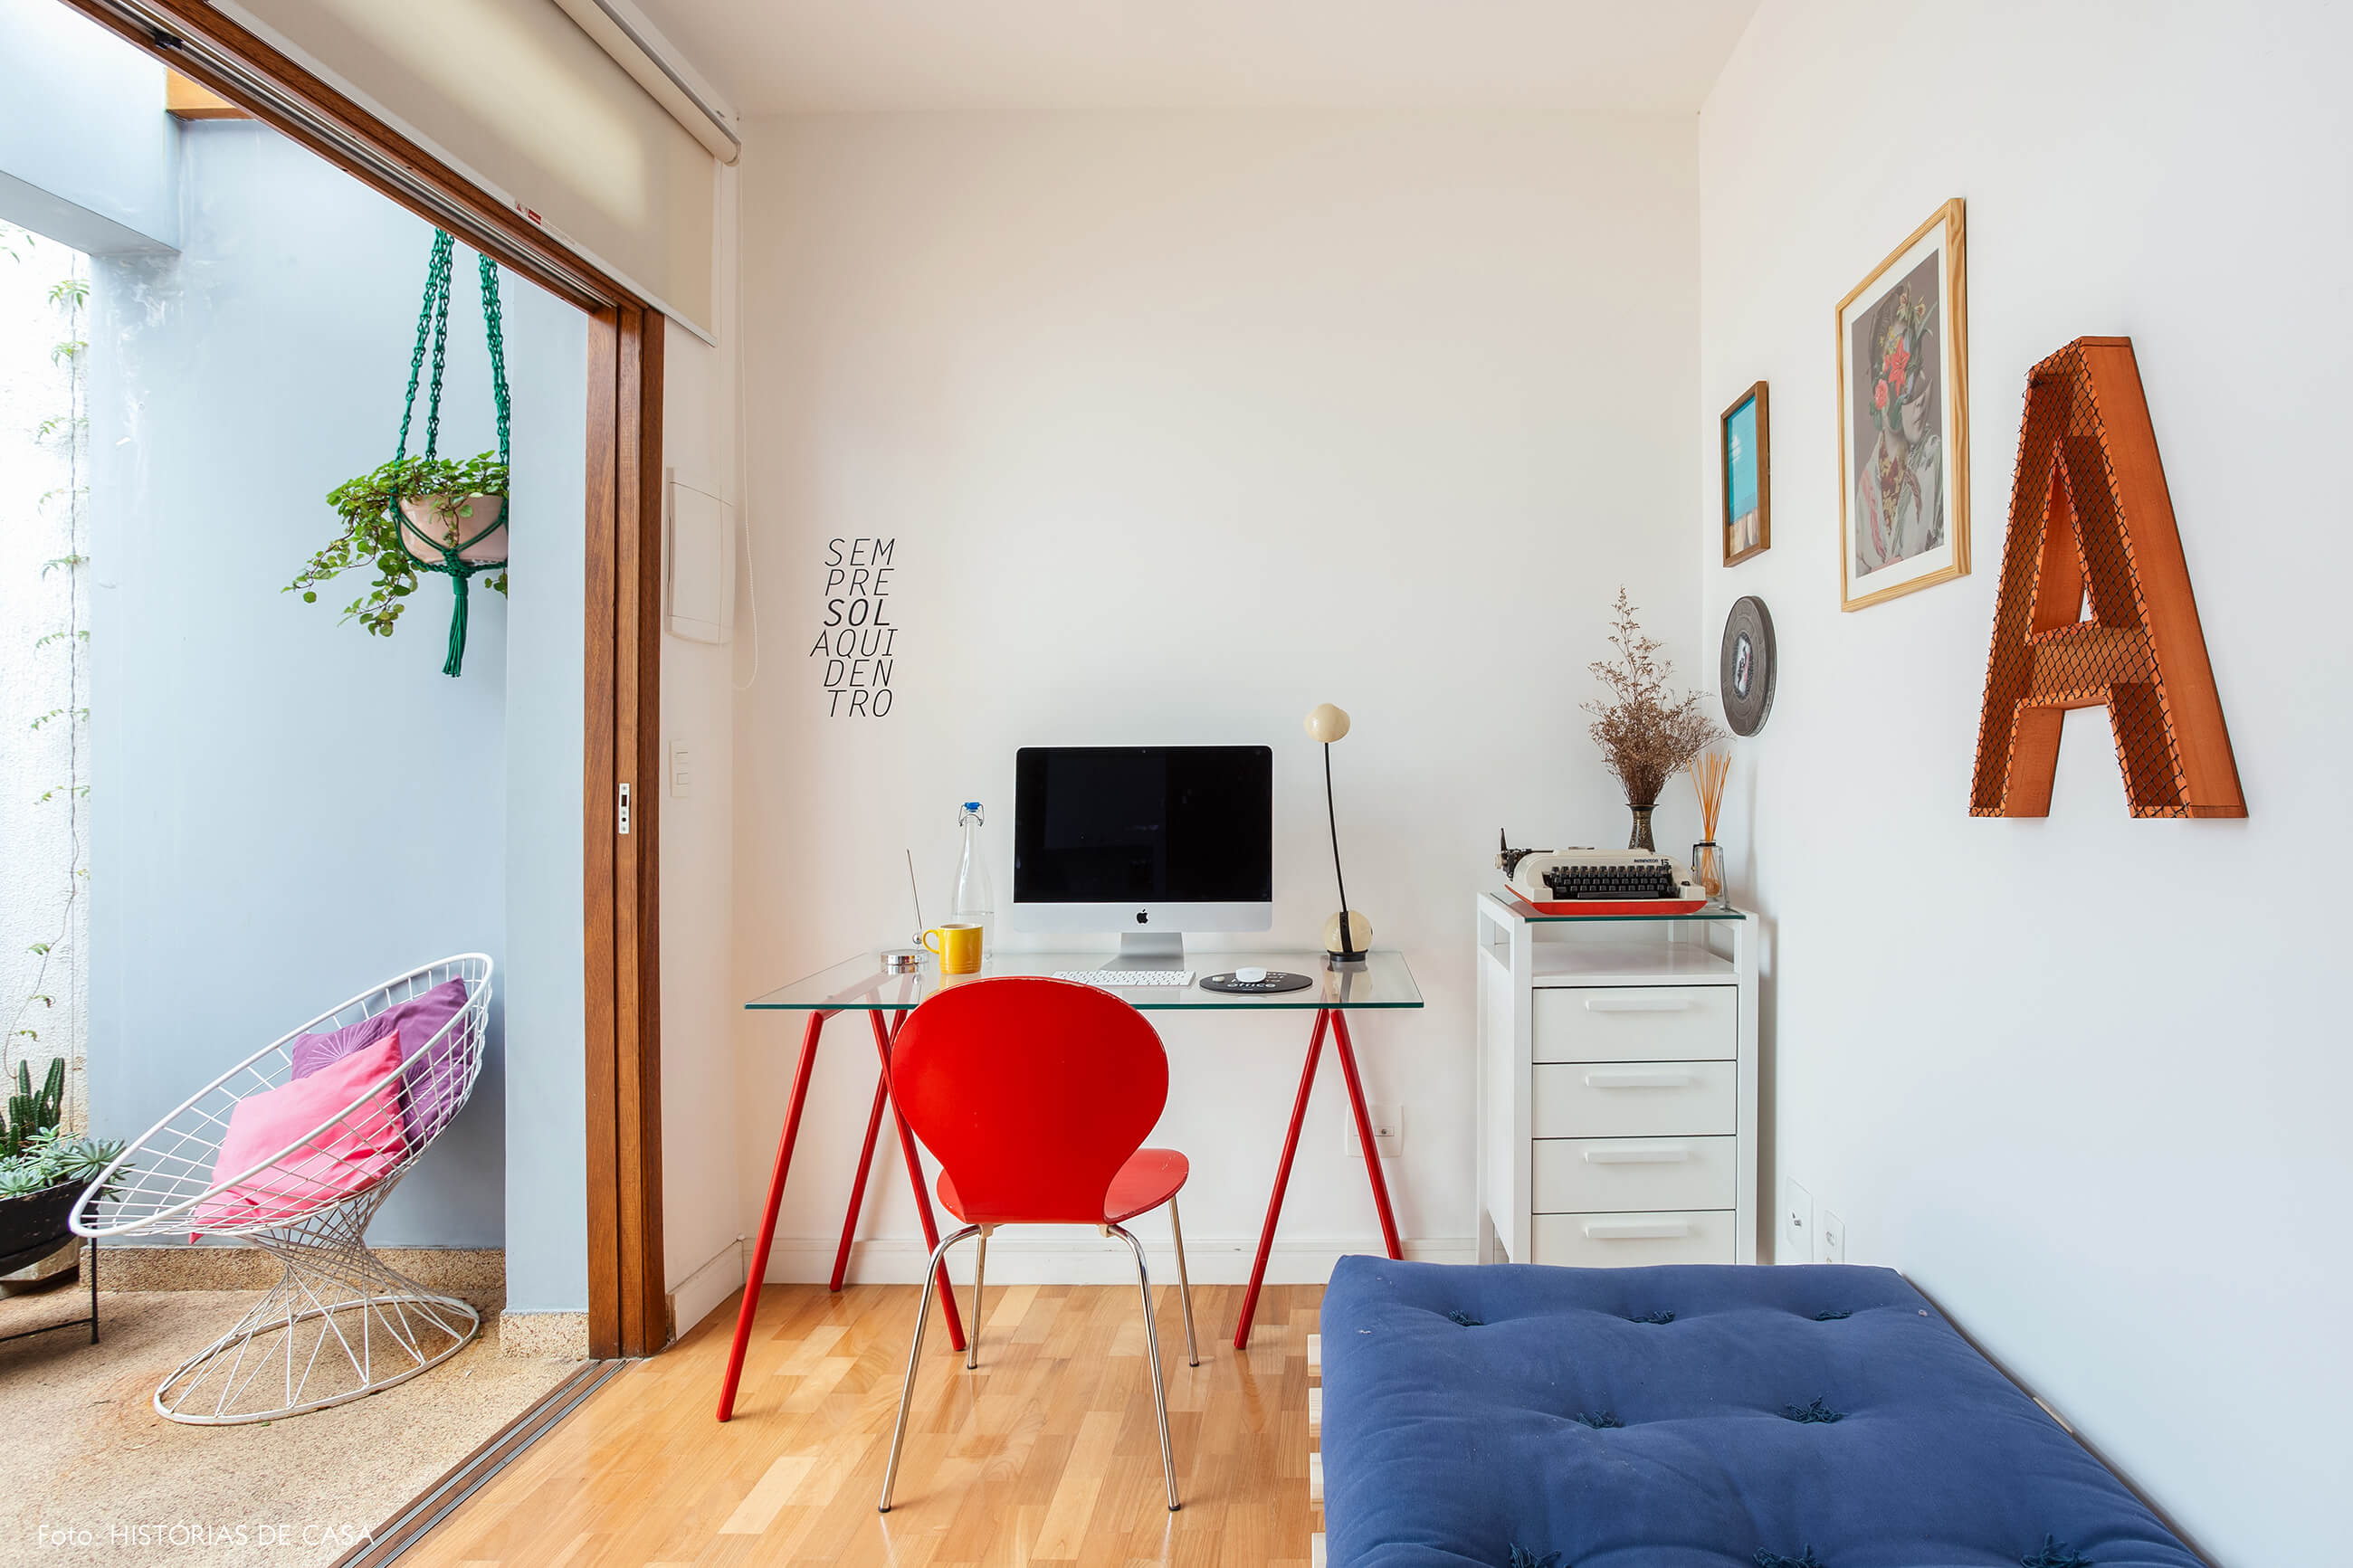 Casa de vila com edícula que funciona como home office